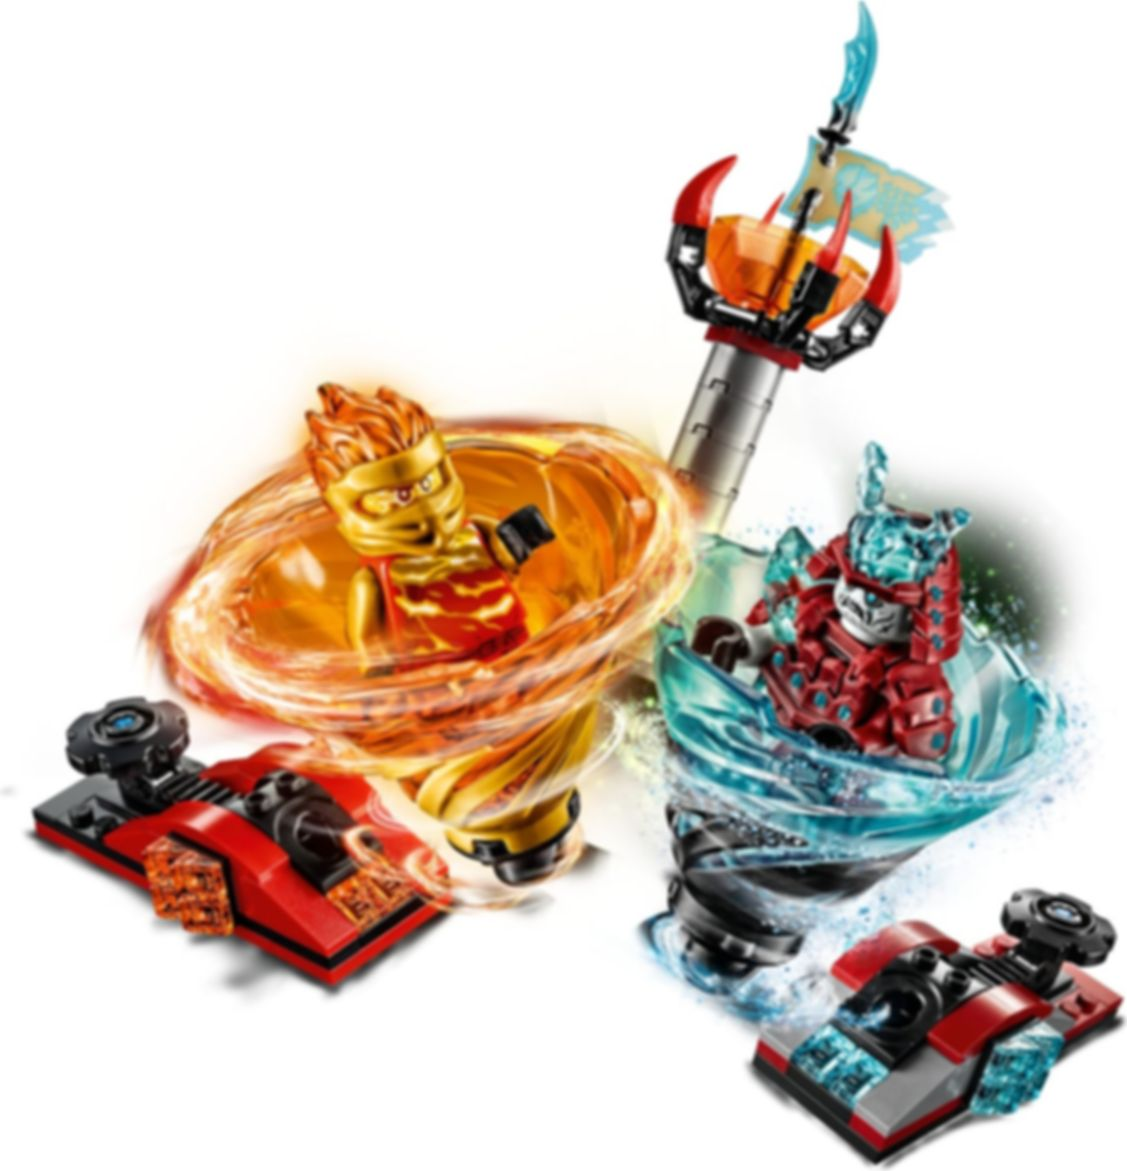 LEGO® Ninjago Spinjitzu Slam - Kai vs. Samurai gameplay